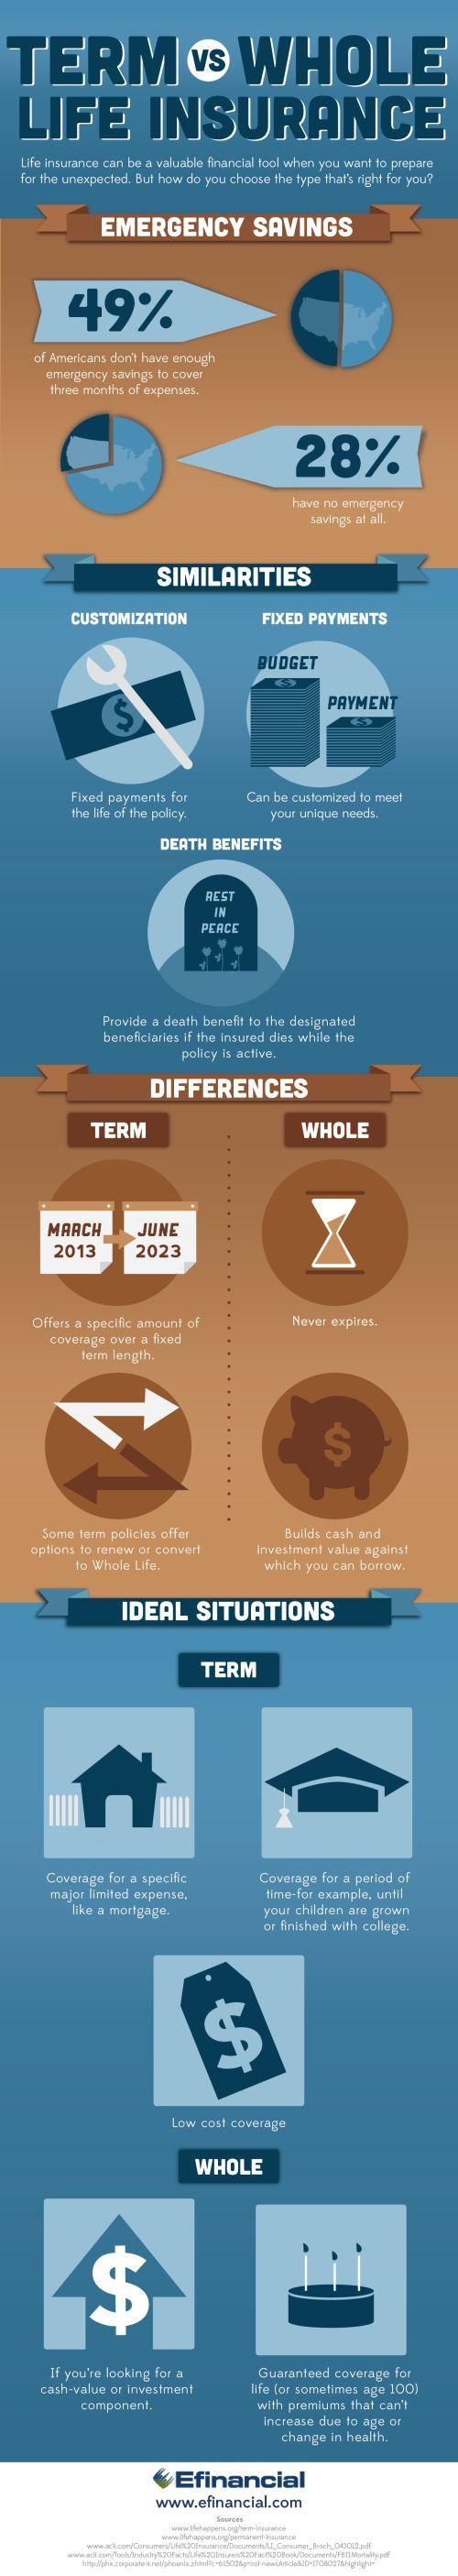 Term vs. Whole Life Insurance Life Insurance Infographic